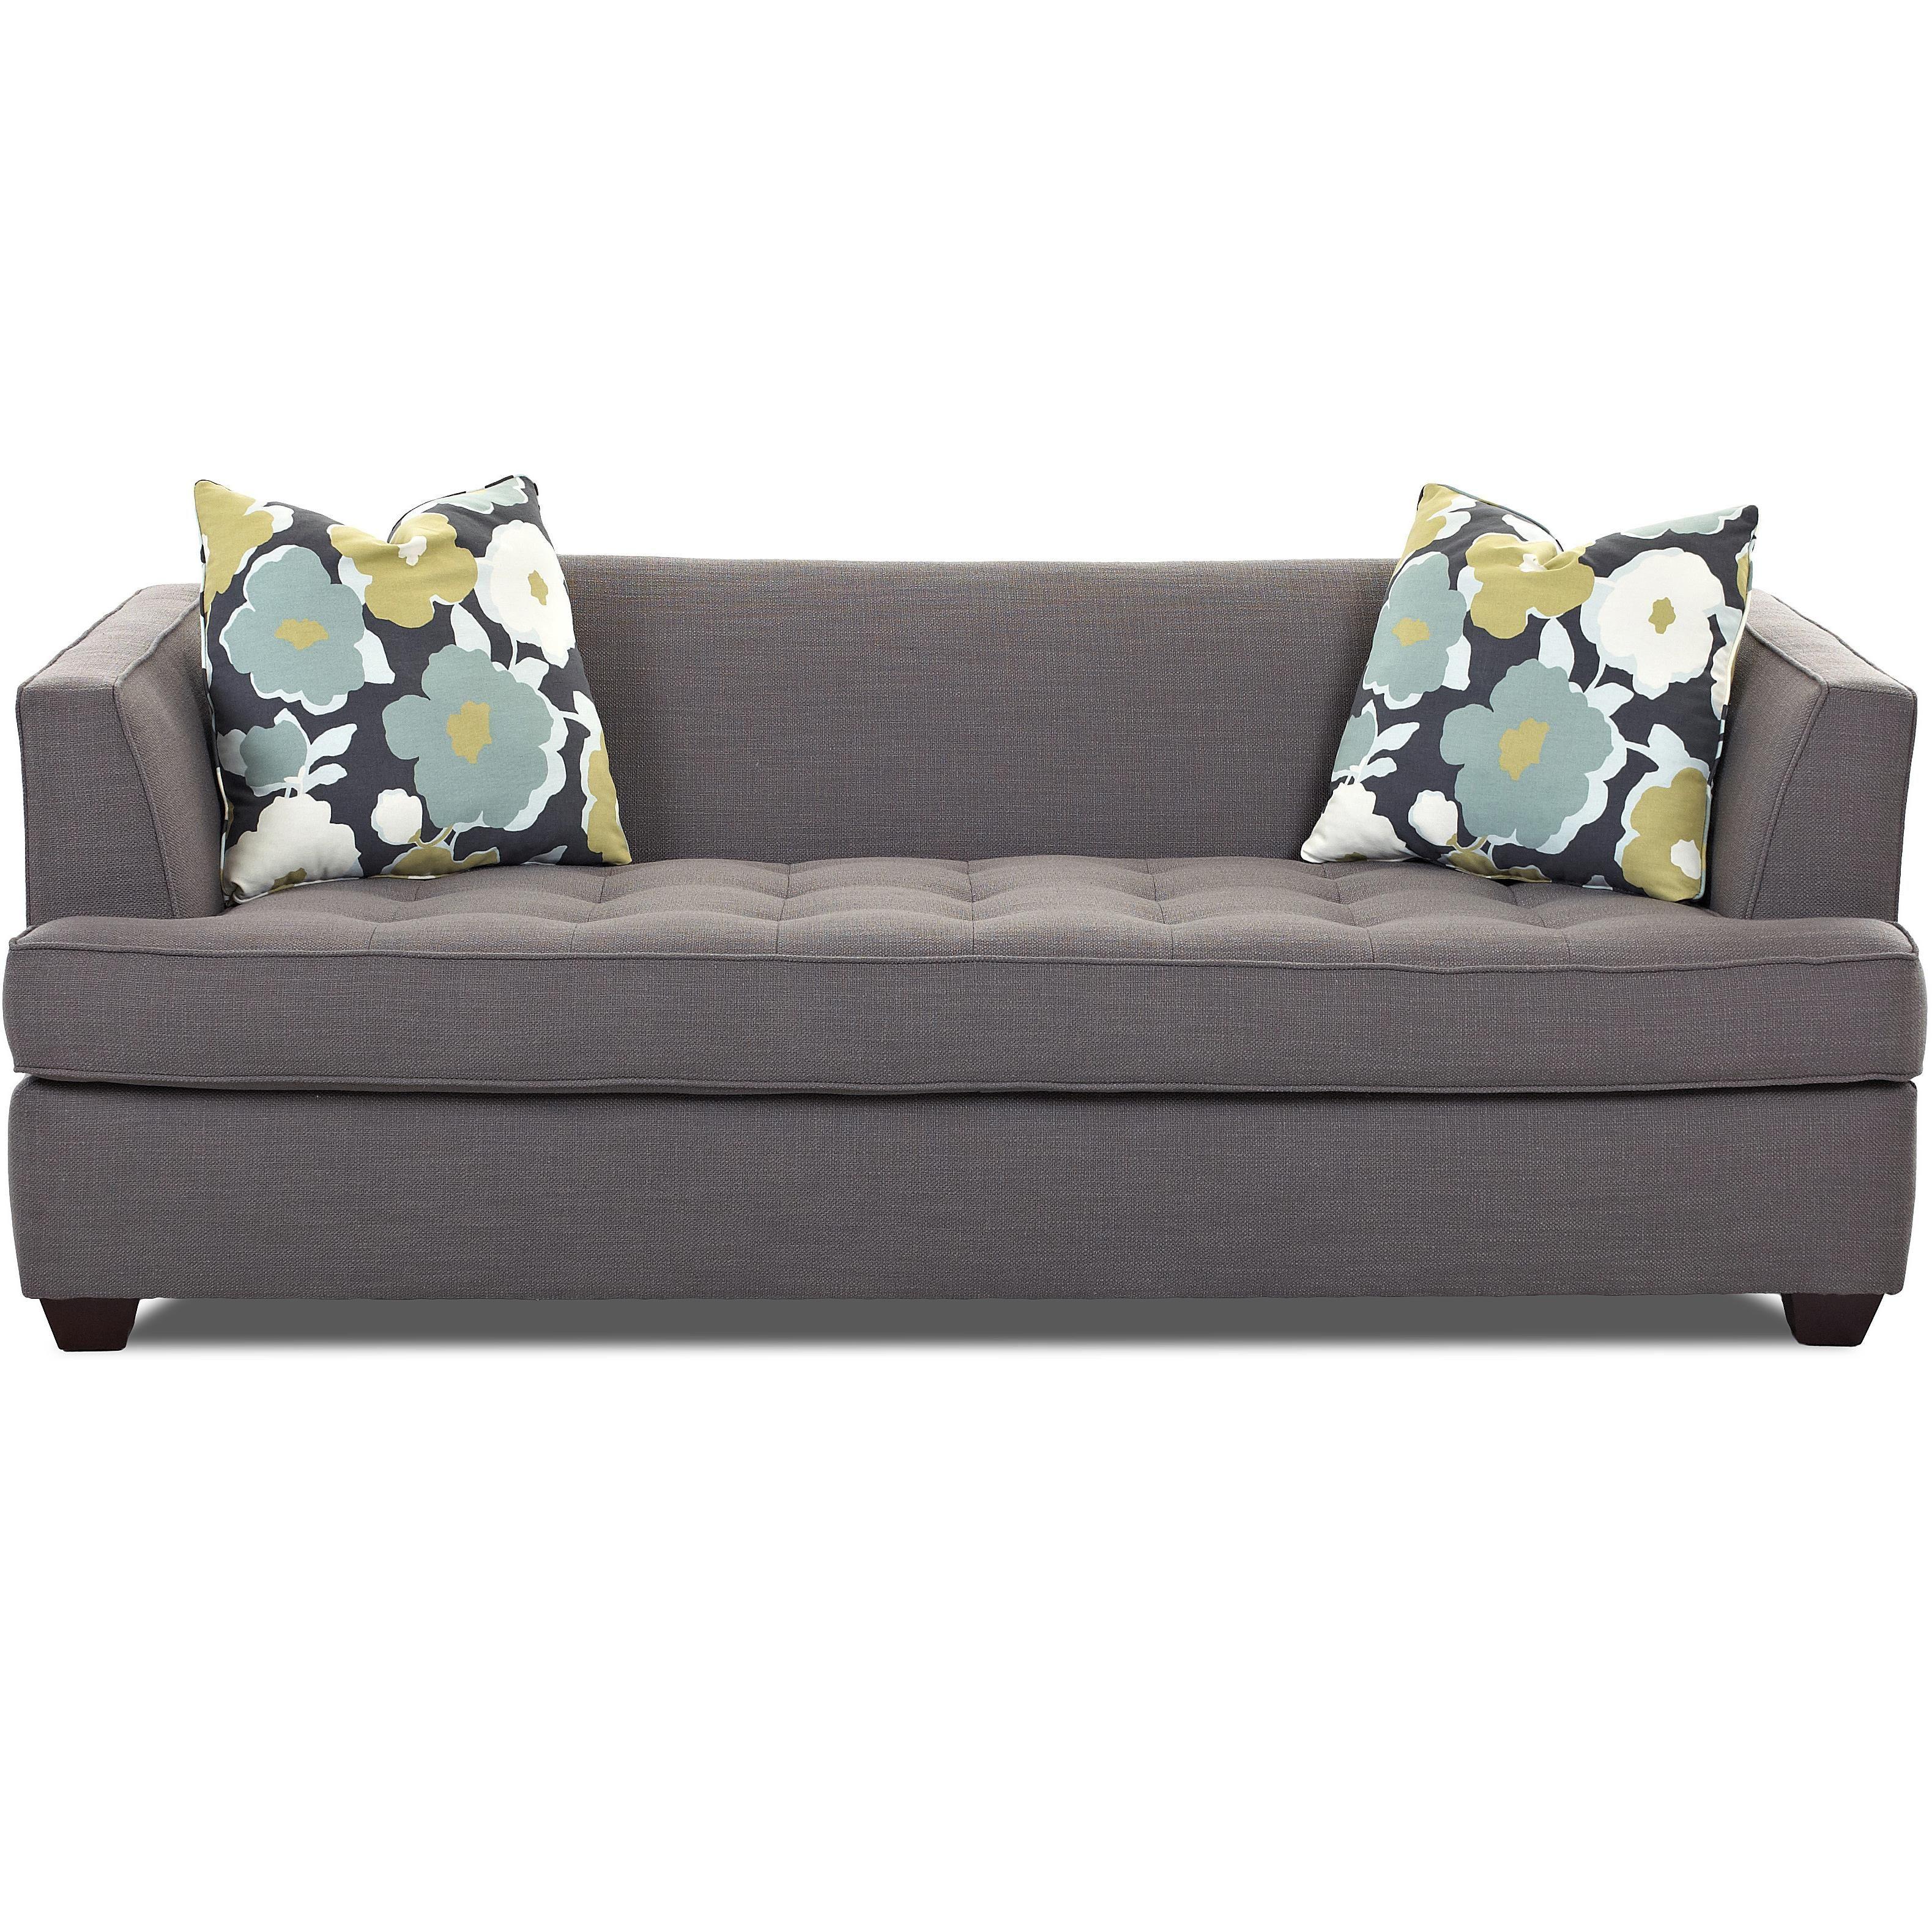 Alex Contemporary Sofa Sleeper By Simple Elegance